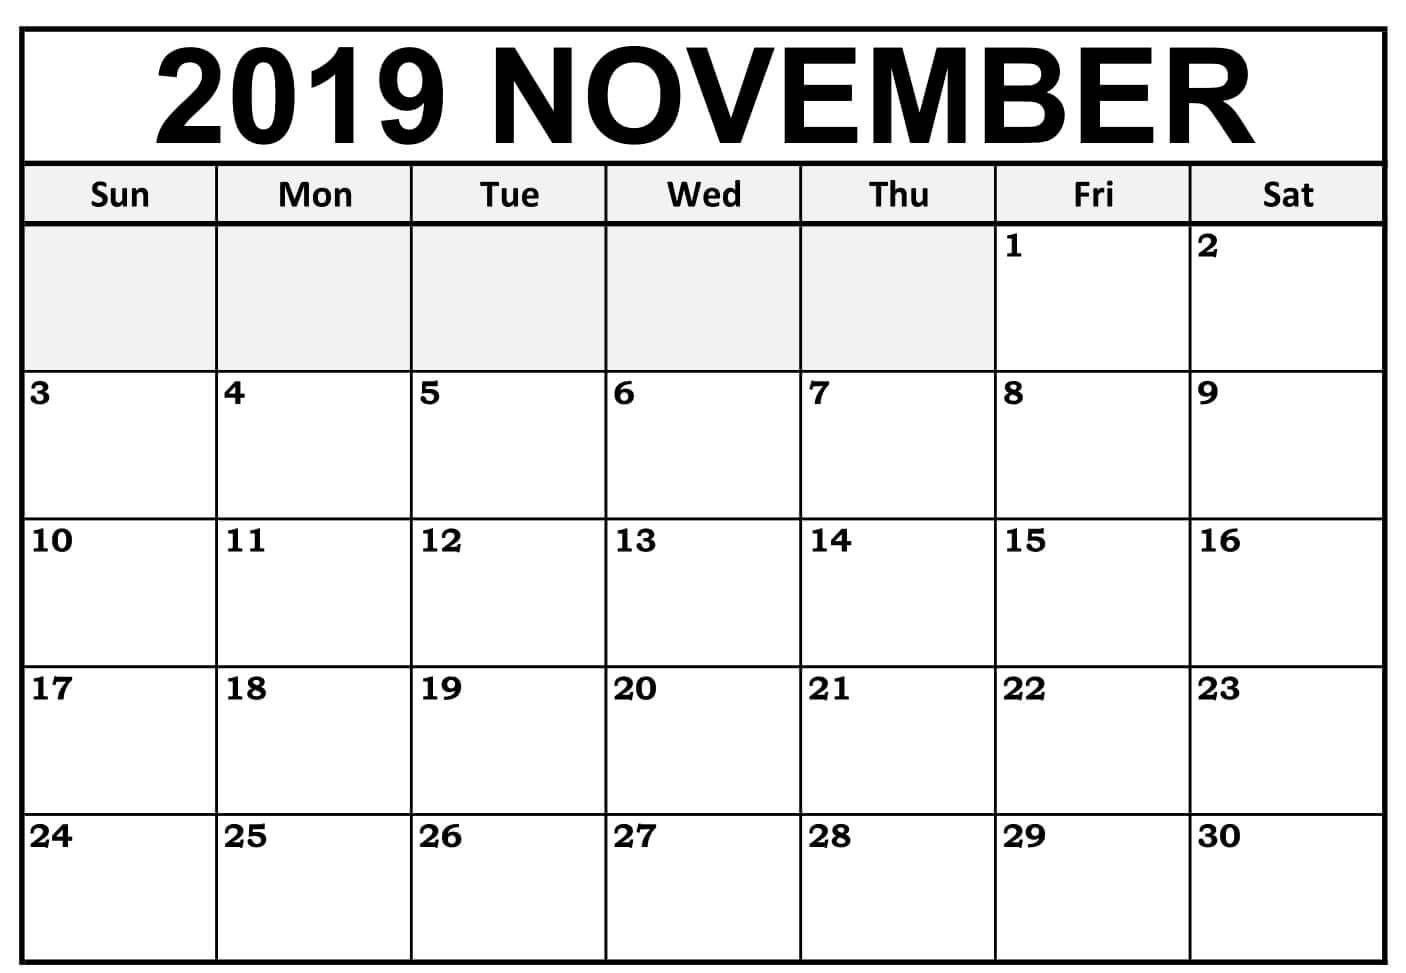 Blank November 2019 Calendar Editable - Free August 2019